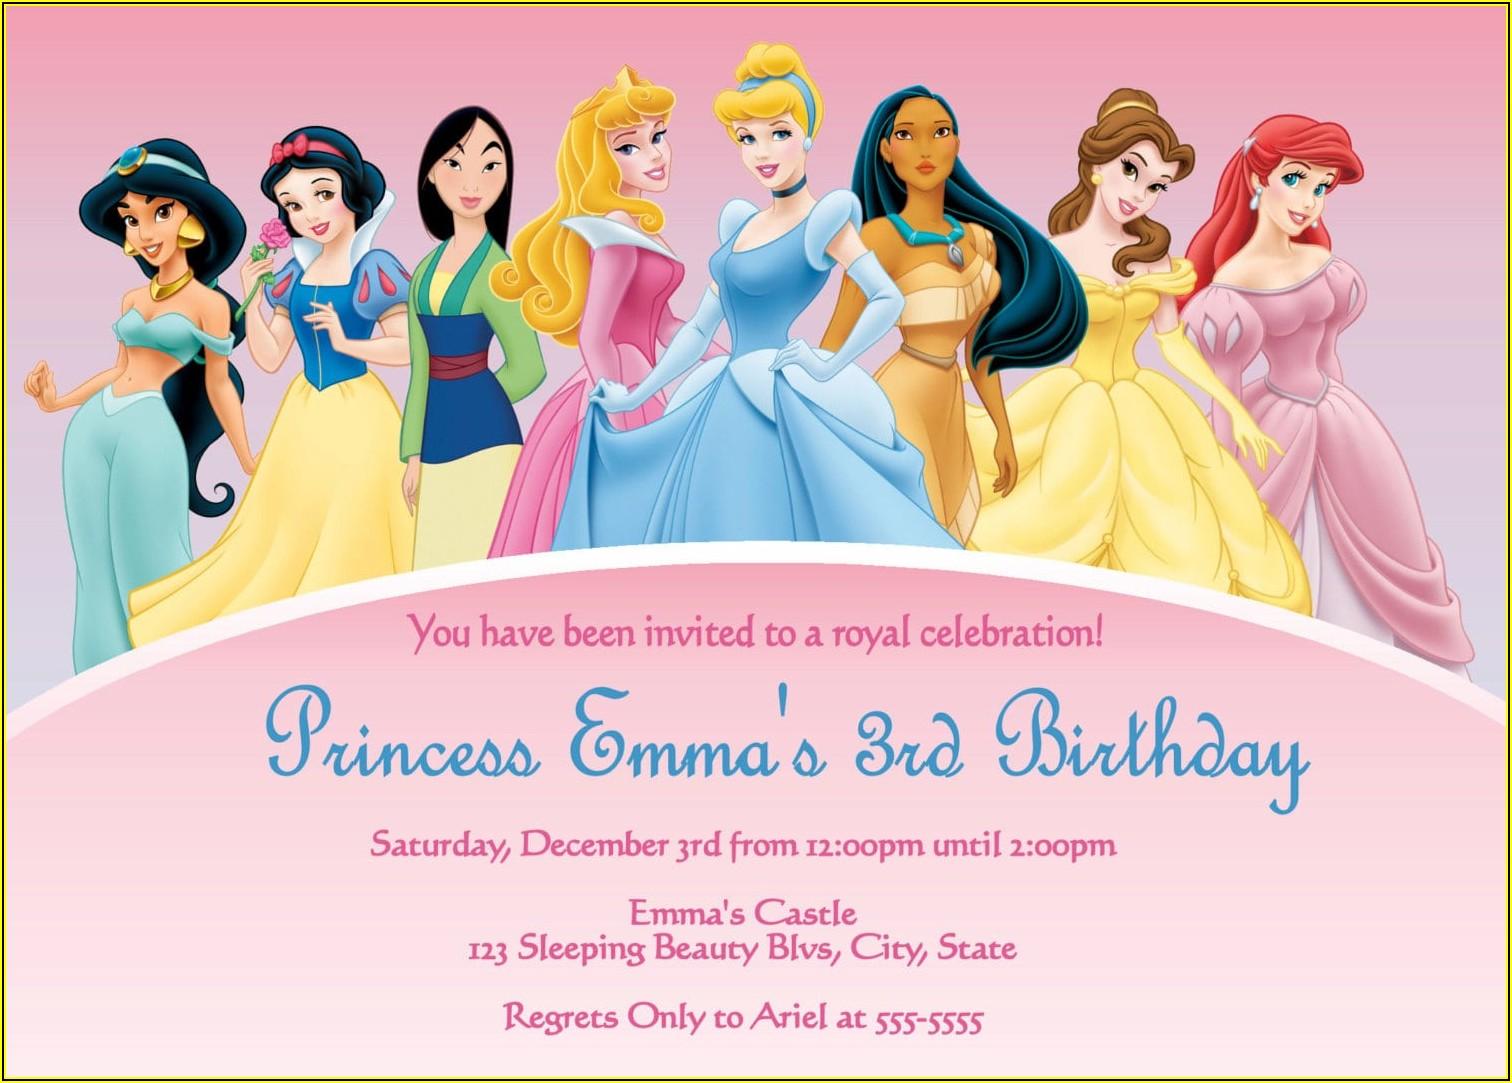 Princess Theme Party Invitation Template